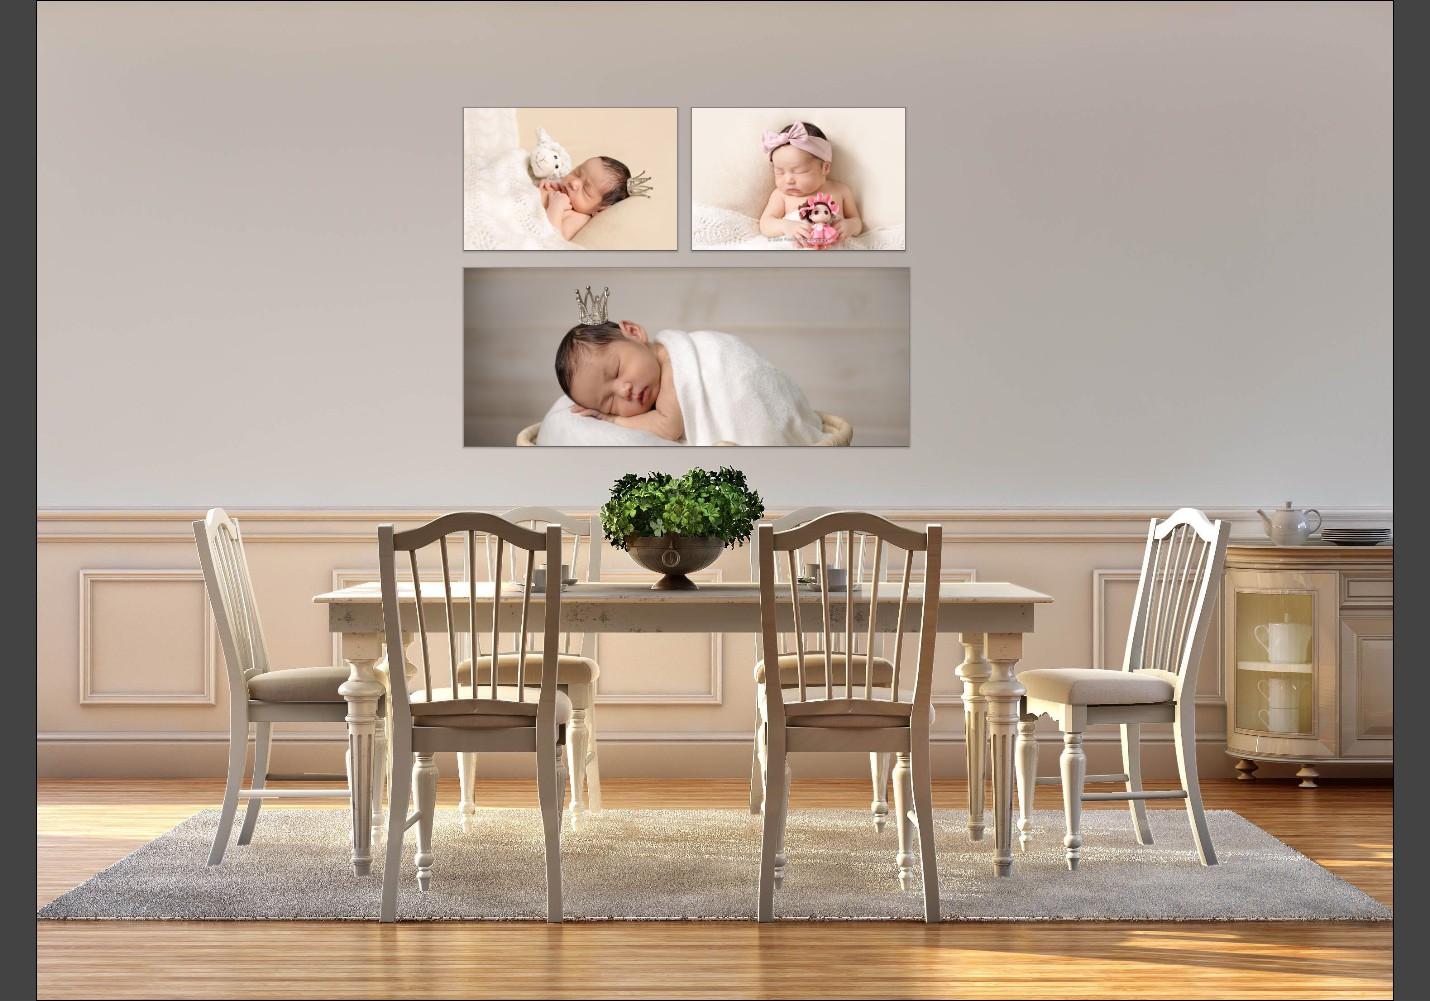 Room view of newborn portrait